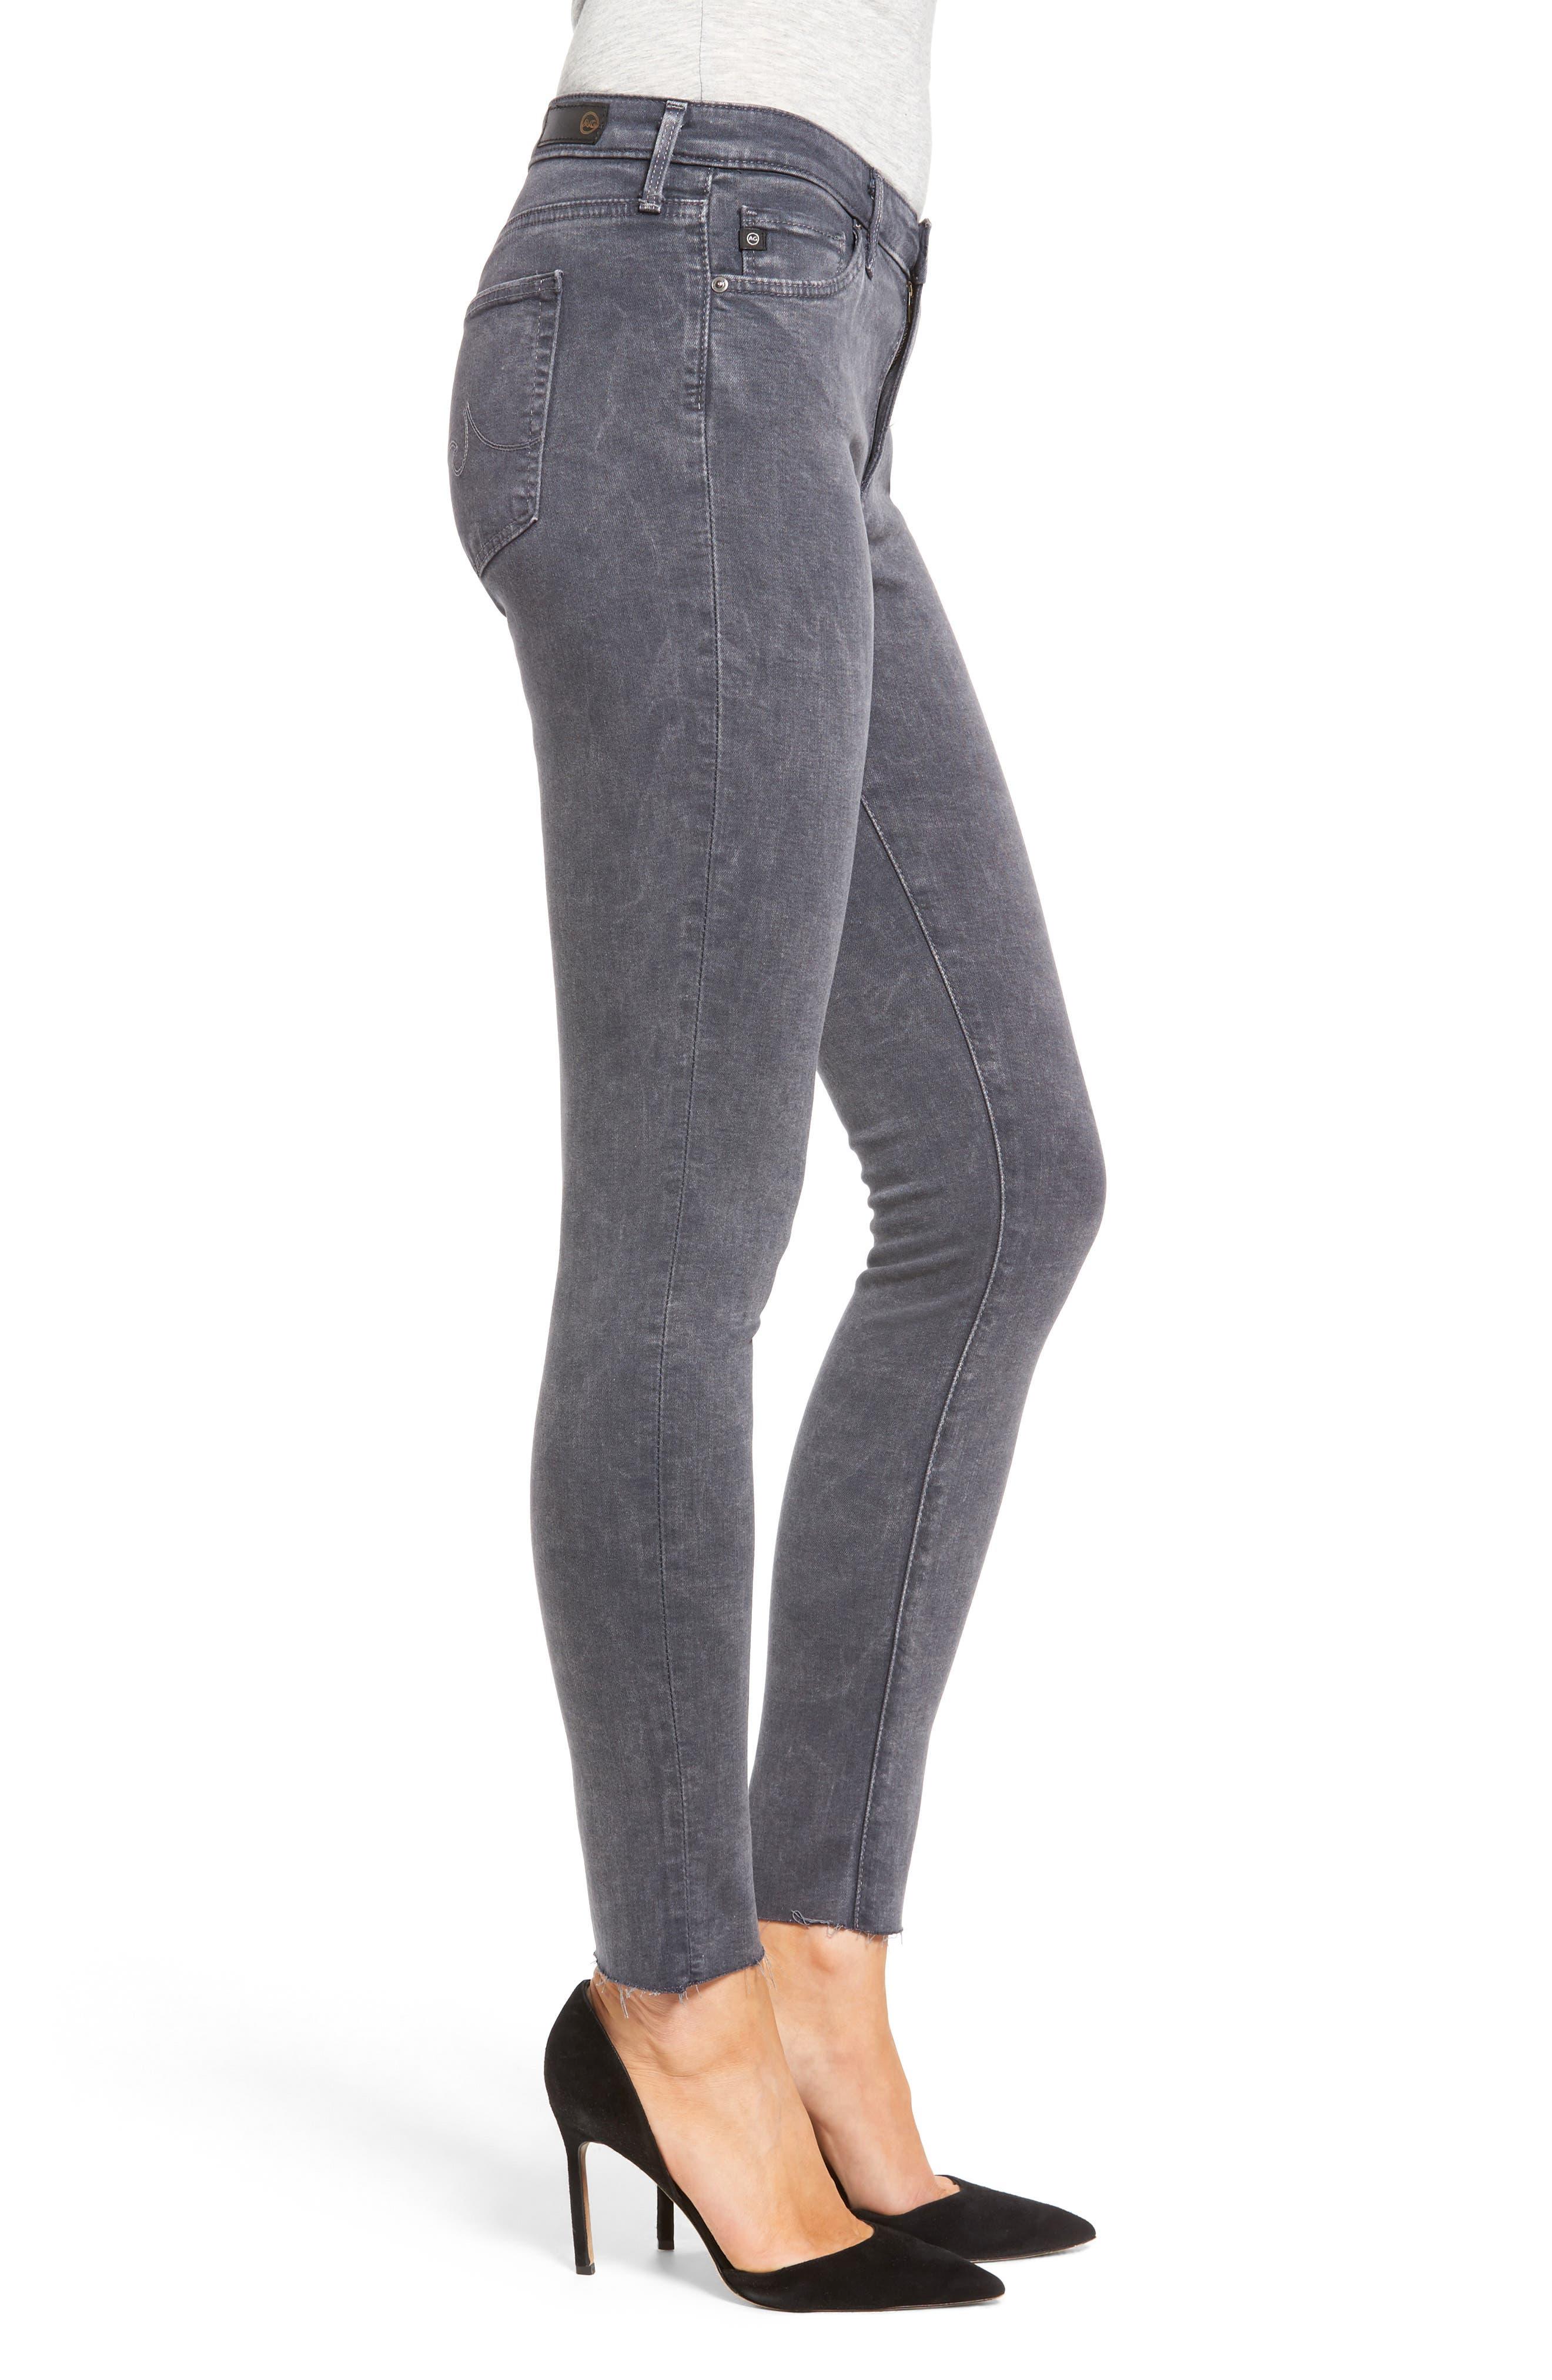 Middi Ankle Skinny Jeans,                             Alternate thumbnail 3, color,                             Erosion